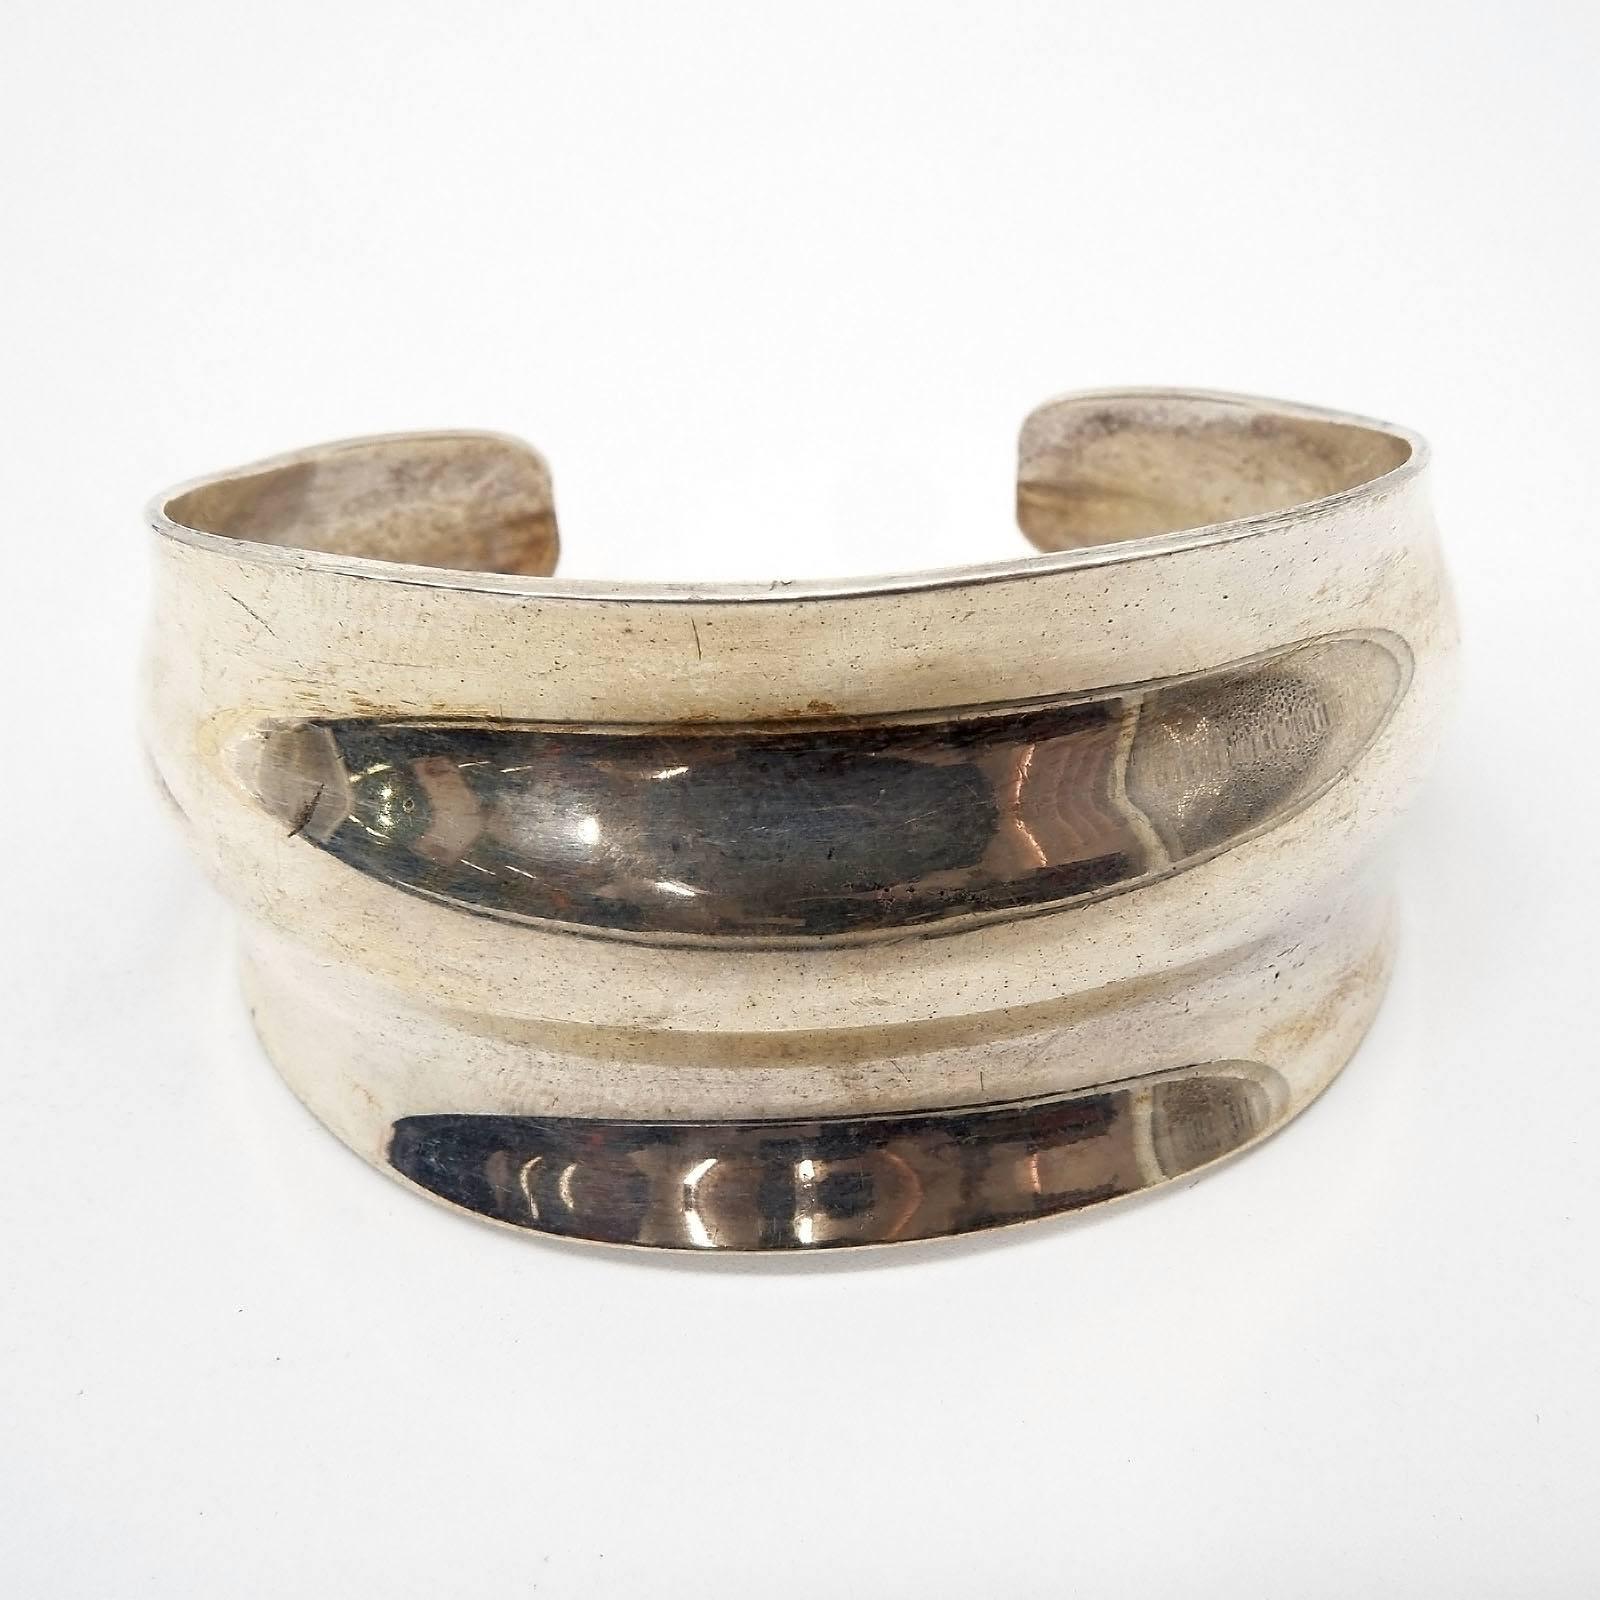 'Gerhardt Sterling Silver Cuff Bangle'